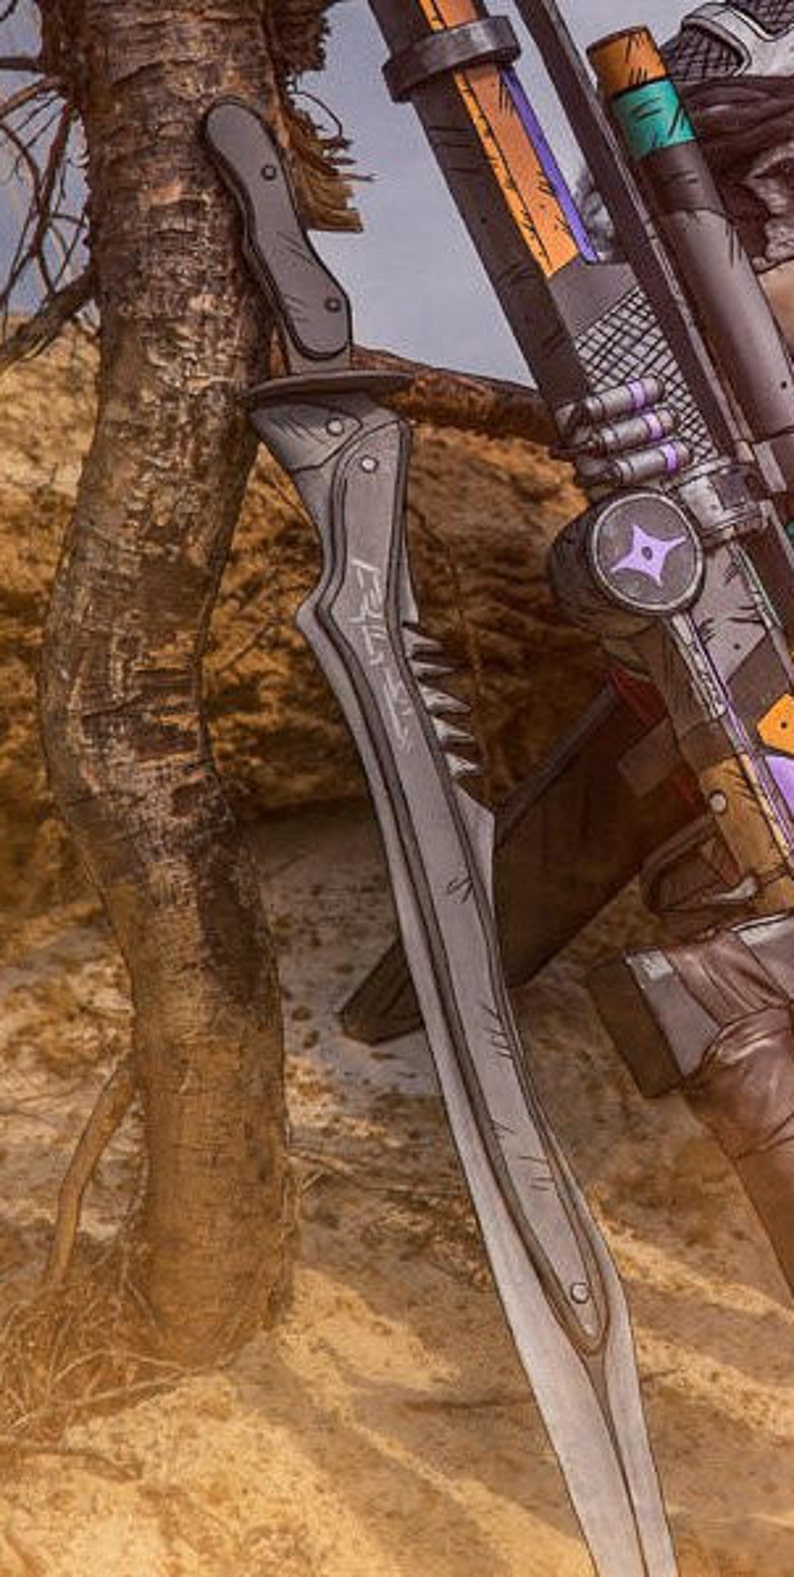 Borderlands 2 Mordecai's Sword (Sword and sheath)